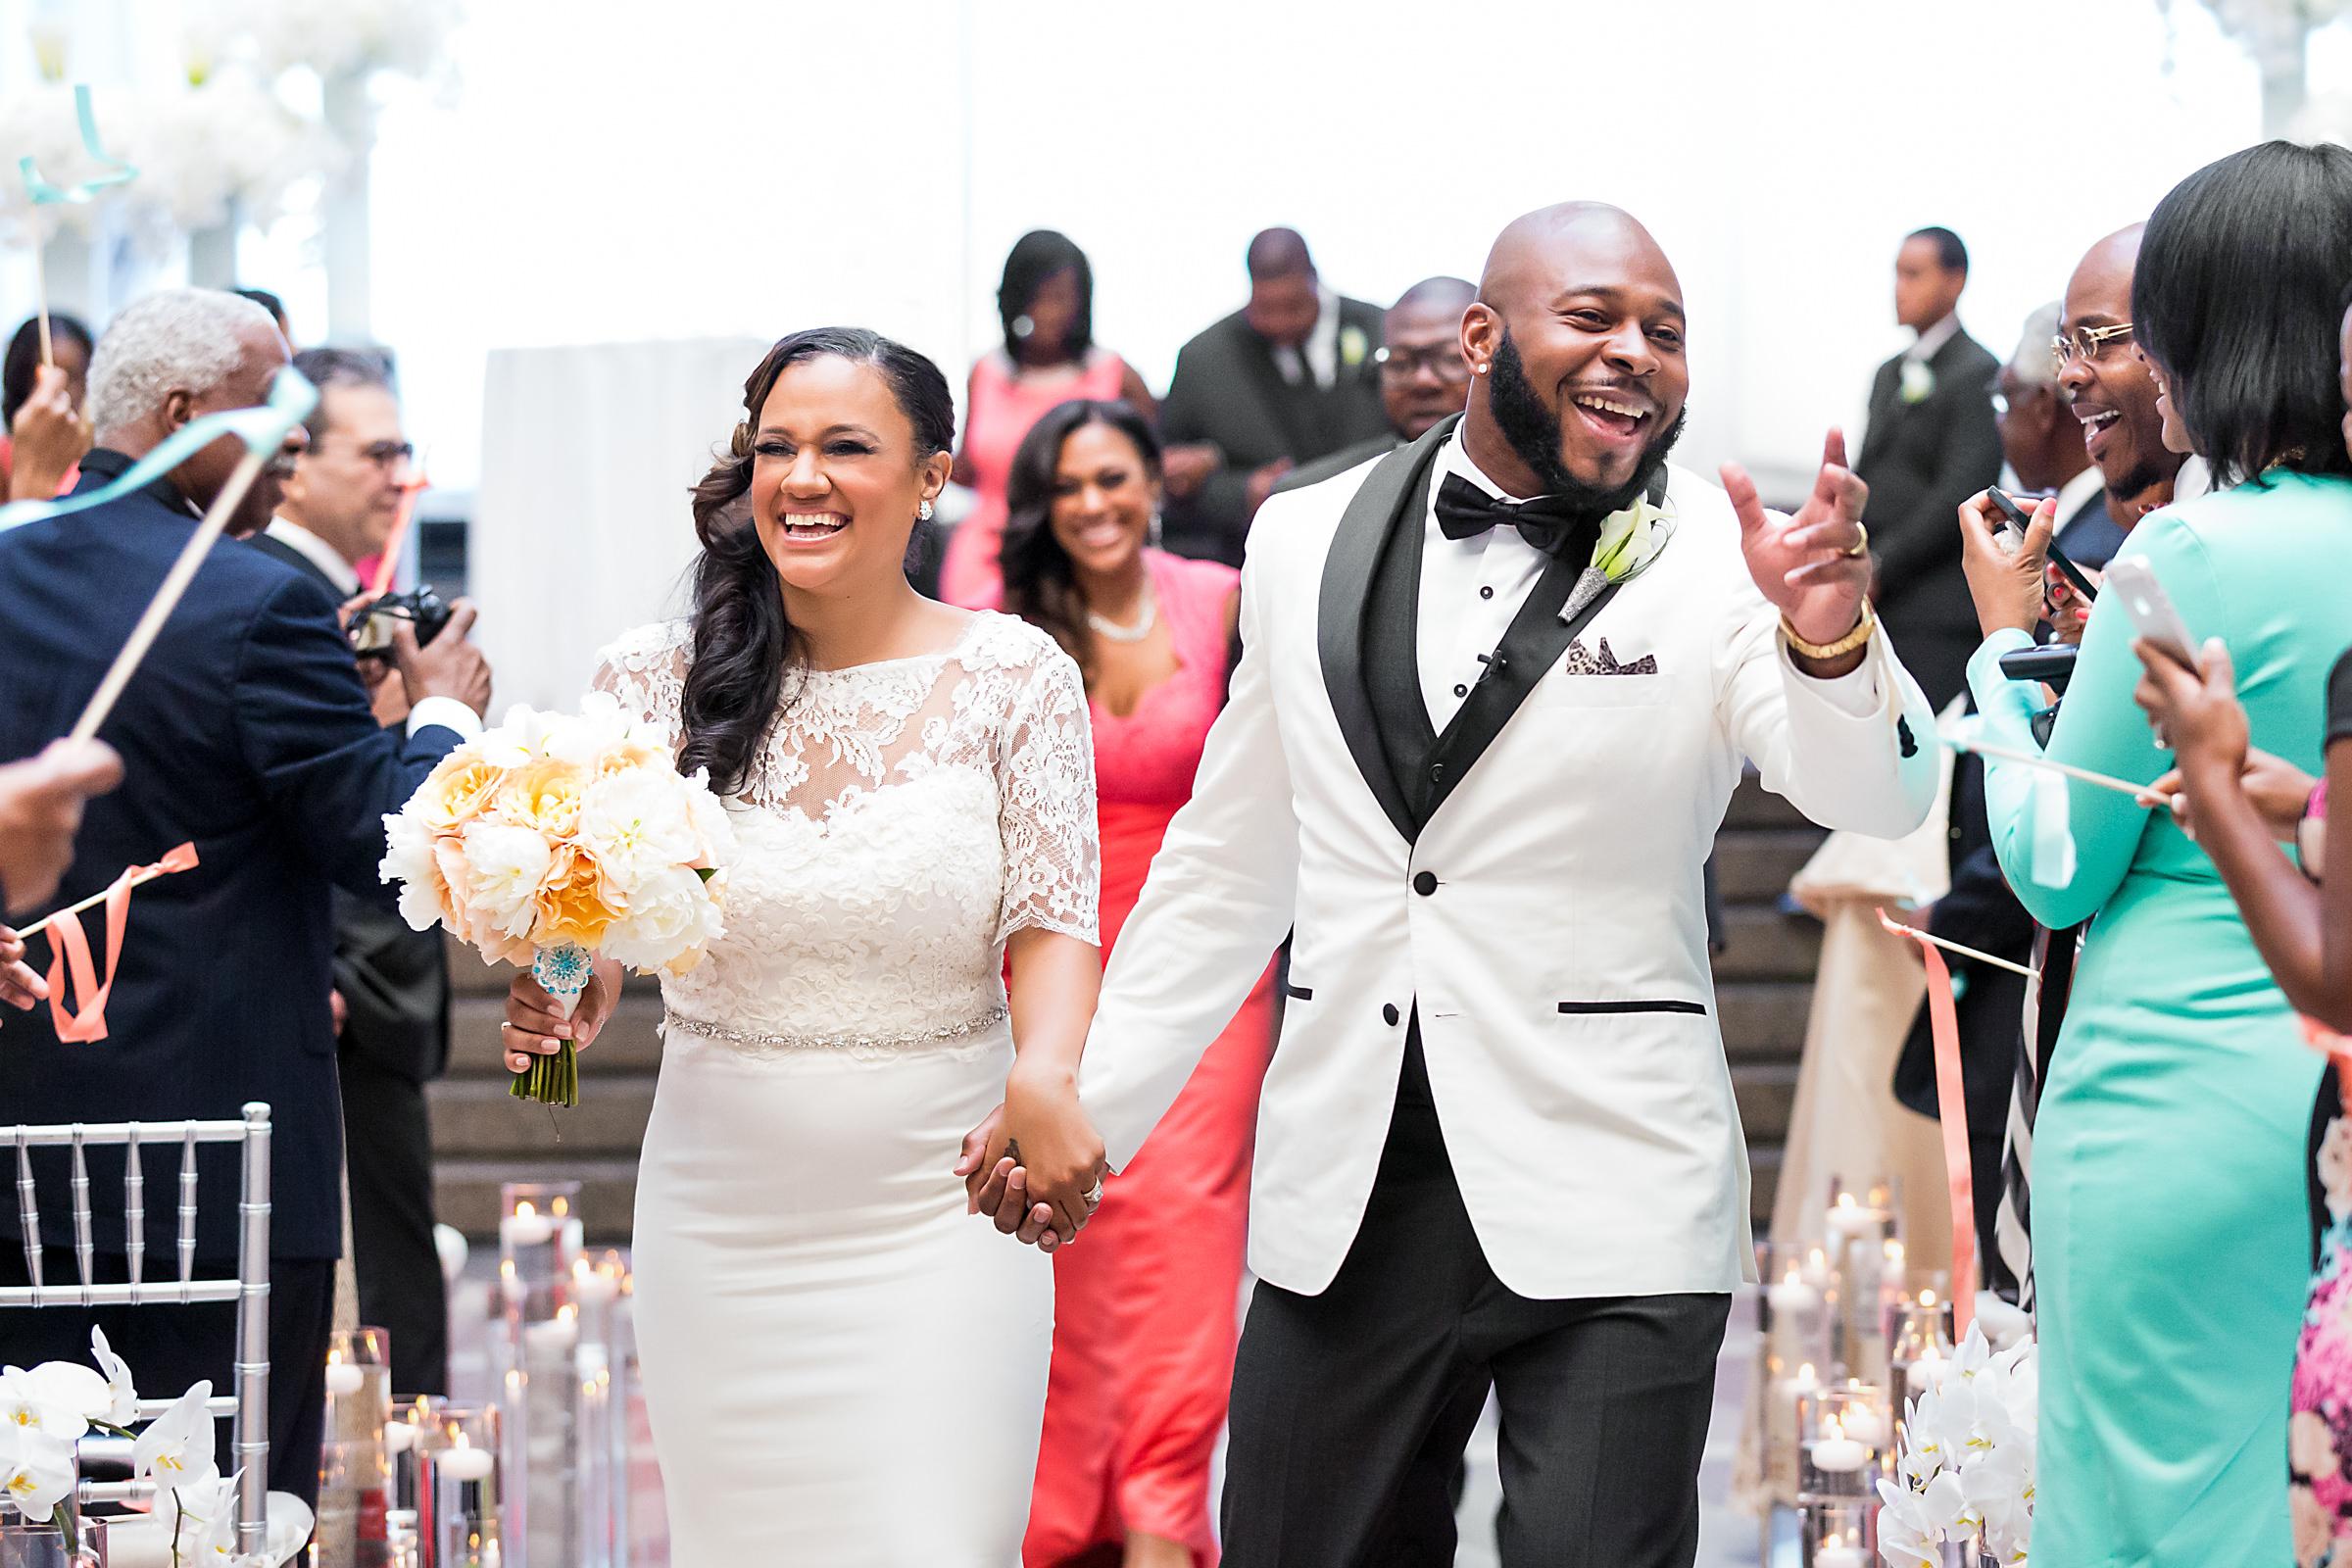 Happy couple walking up the aisle - photo by Procopio Photography